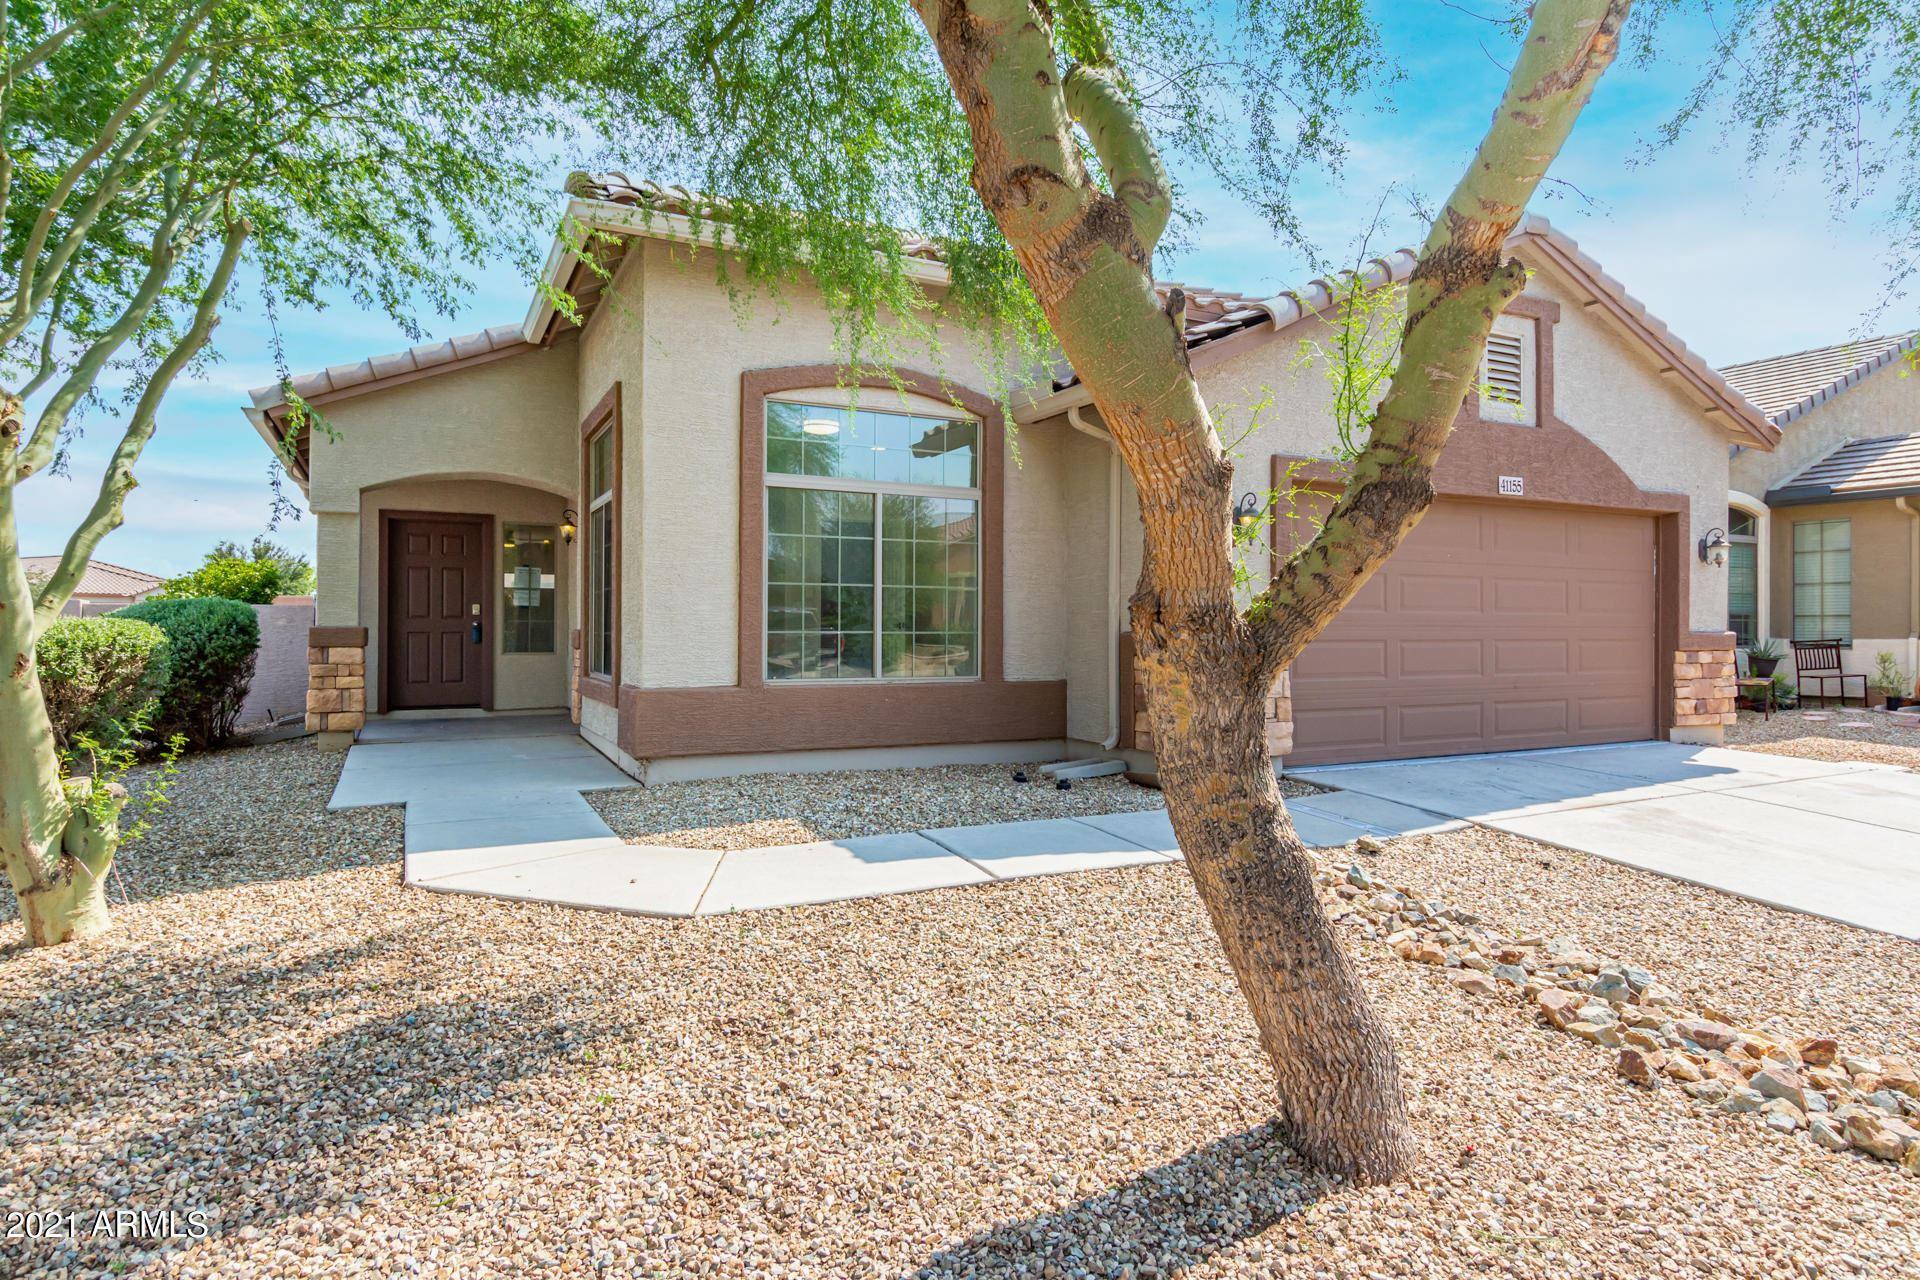 Photo for 41155 W LARAMIE Road, Maricopa, AZ 85138 (MLS # 6282315)